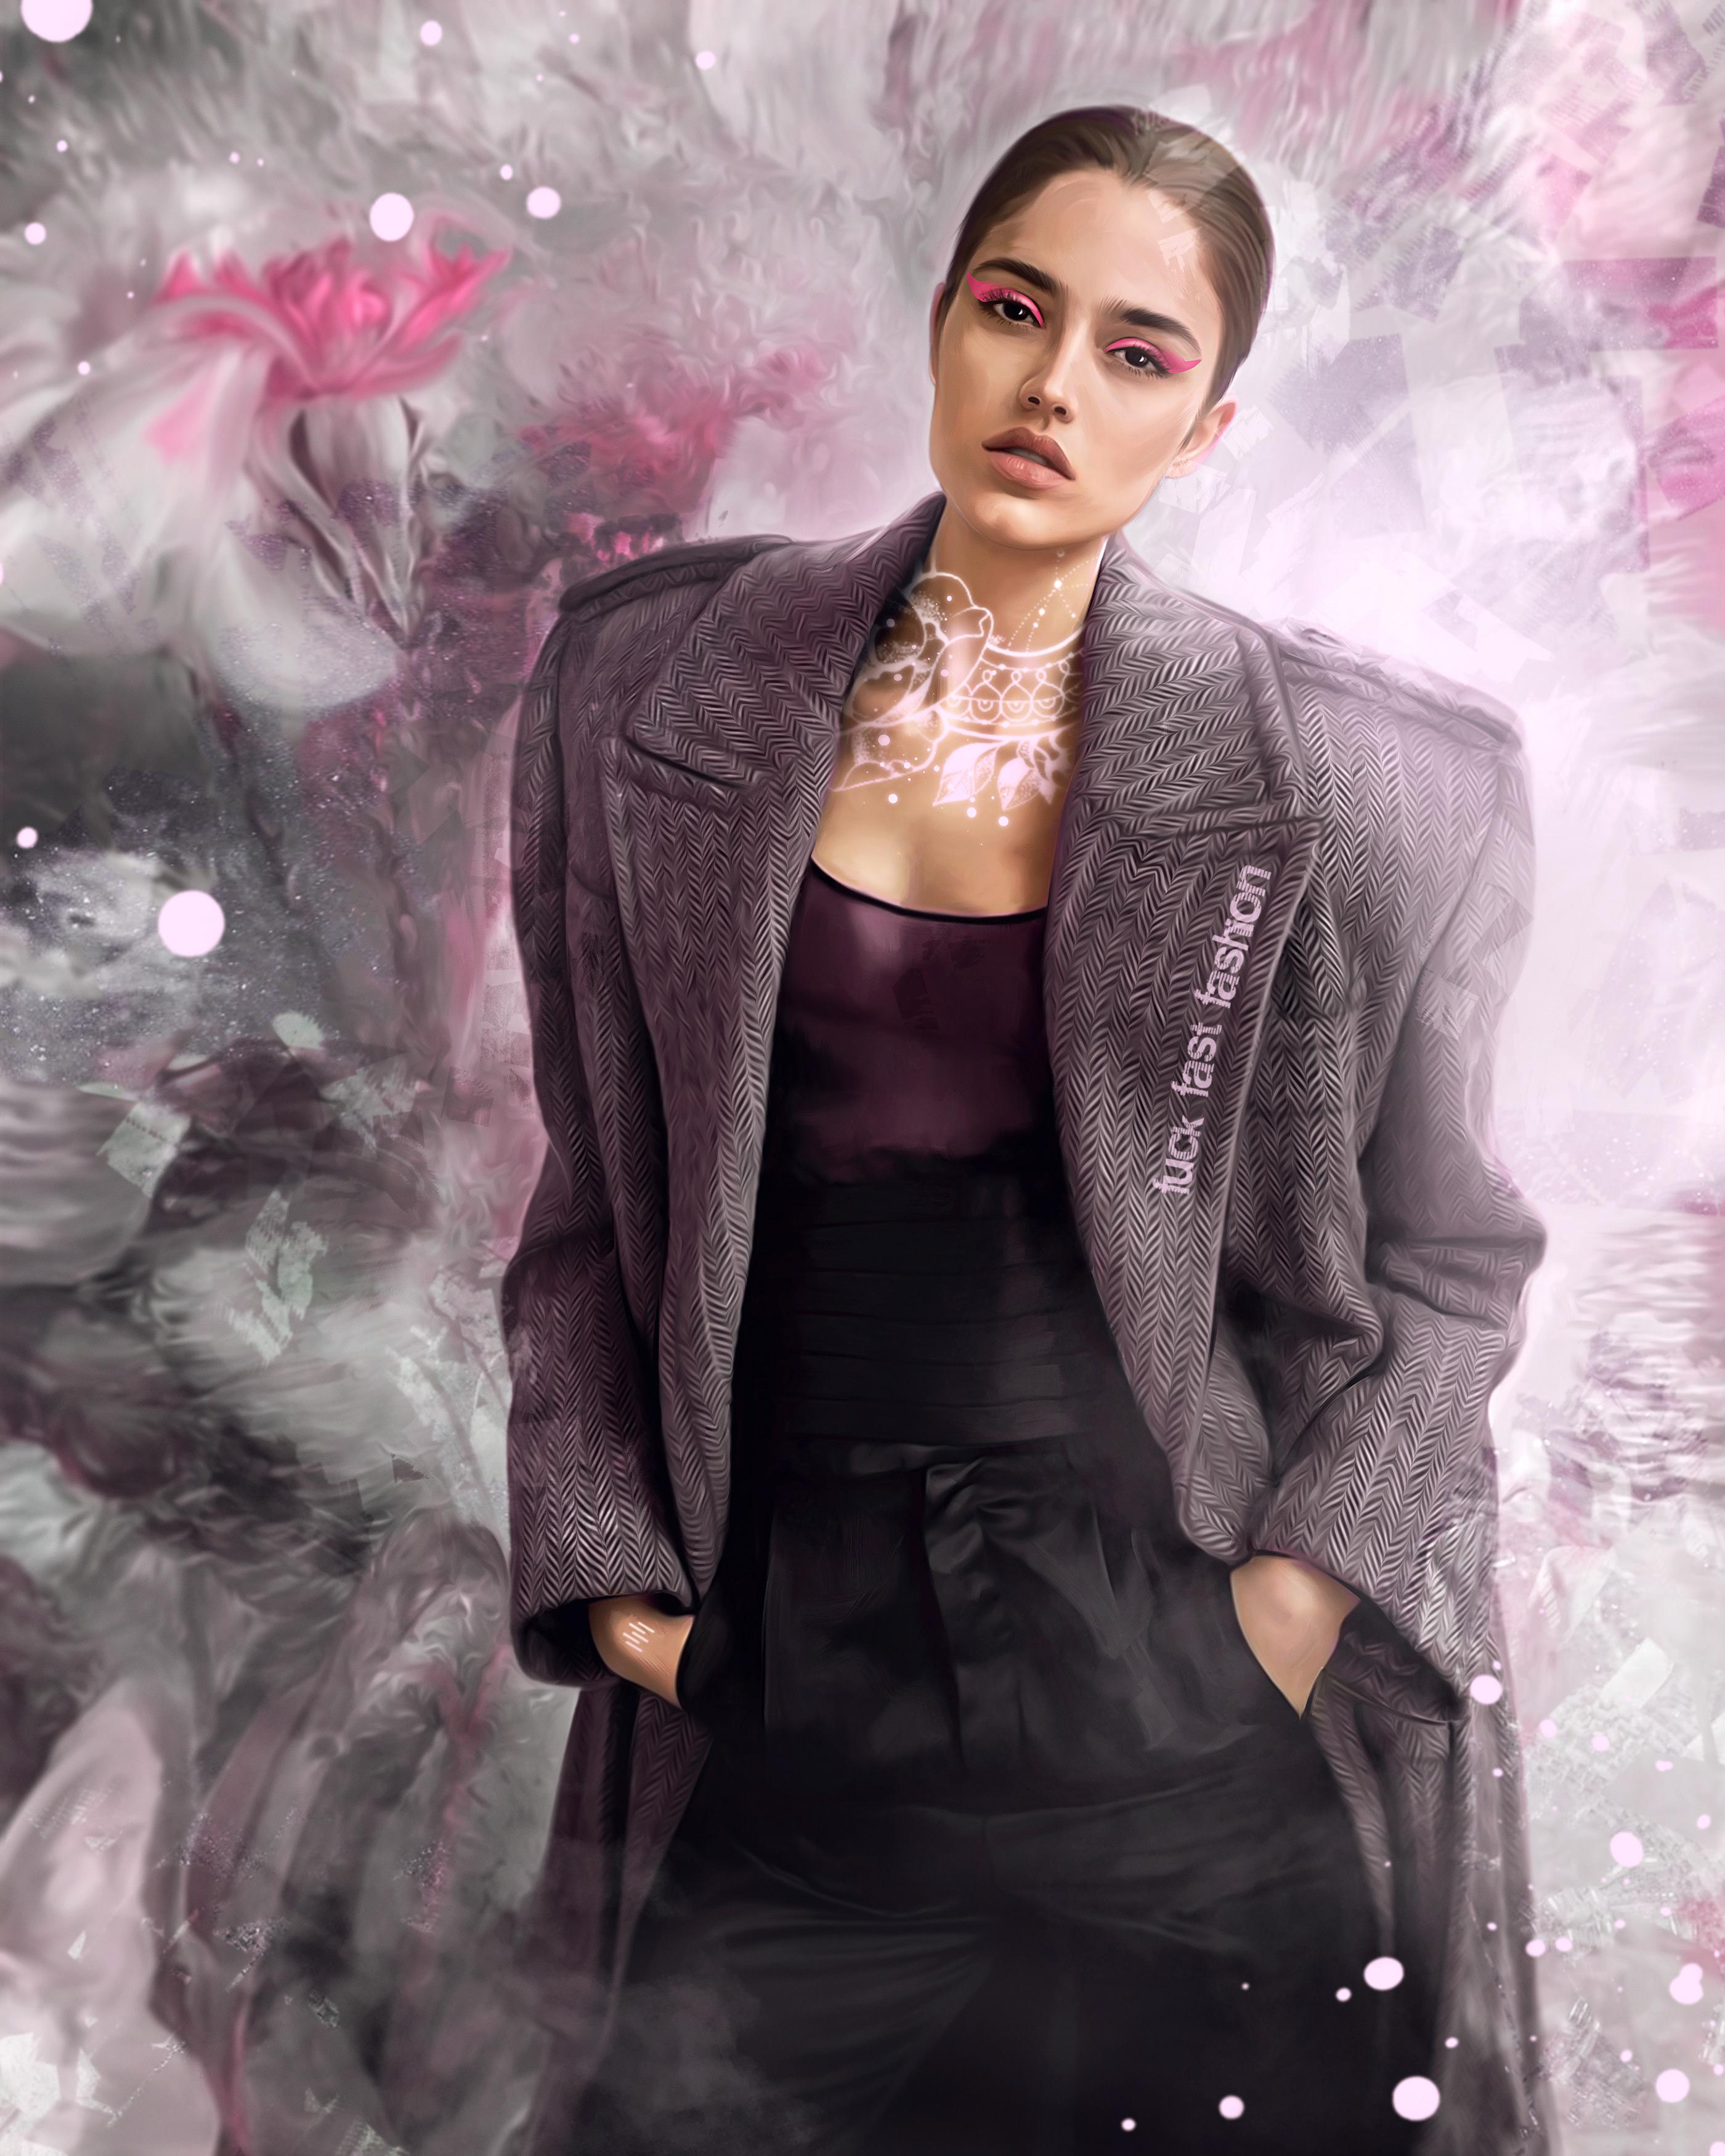 ,painting, drawing,Illustration,Fashion,Digital Art